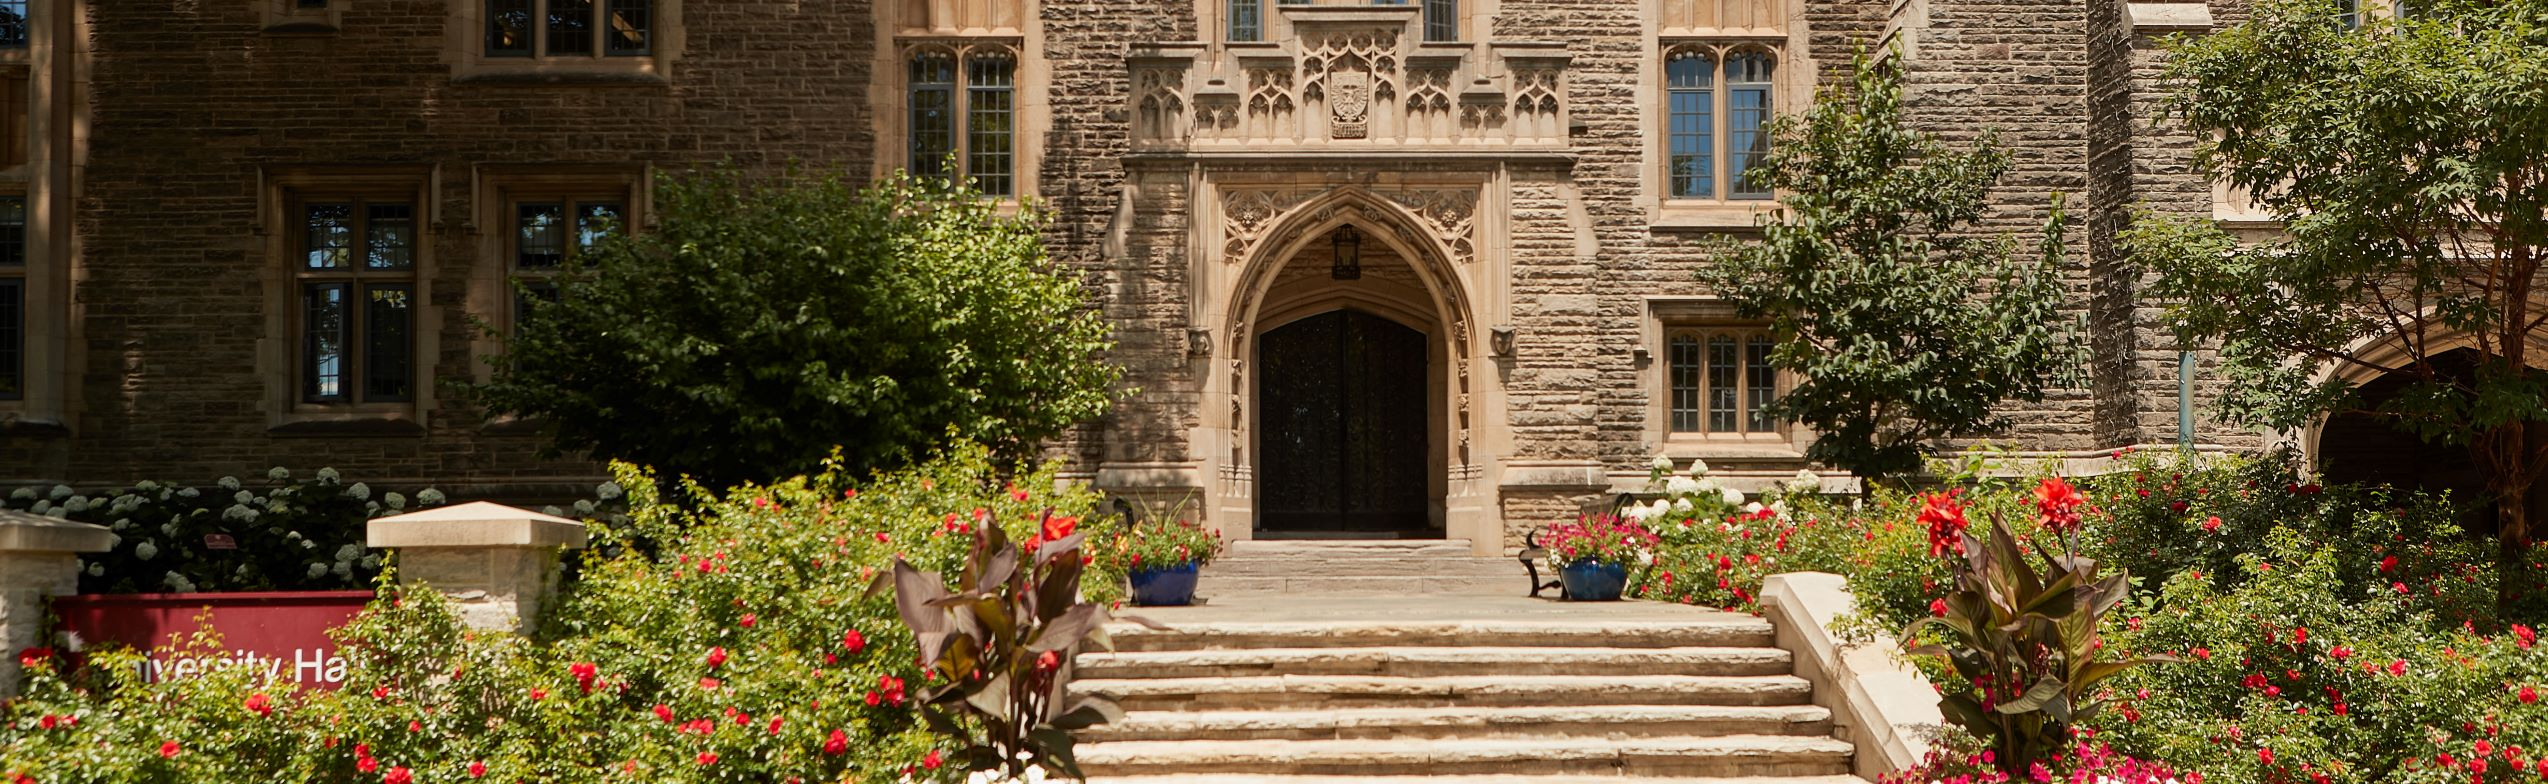 university hall entrance